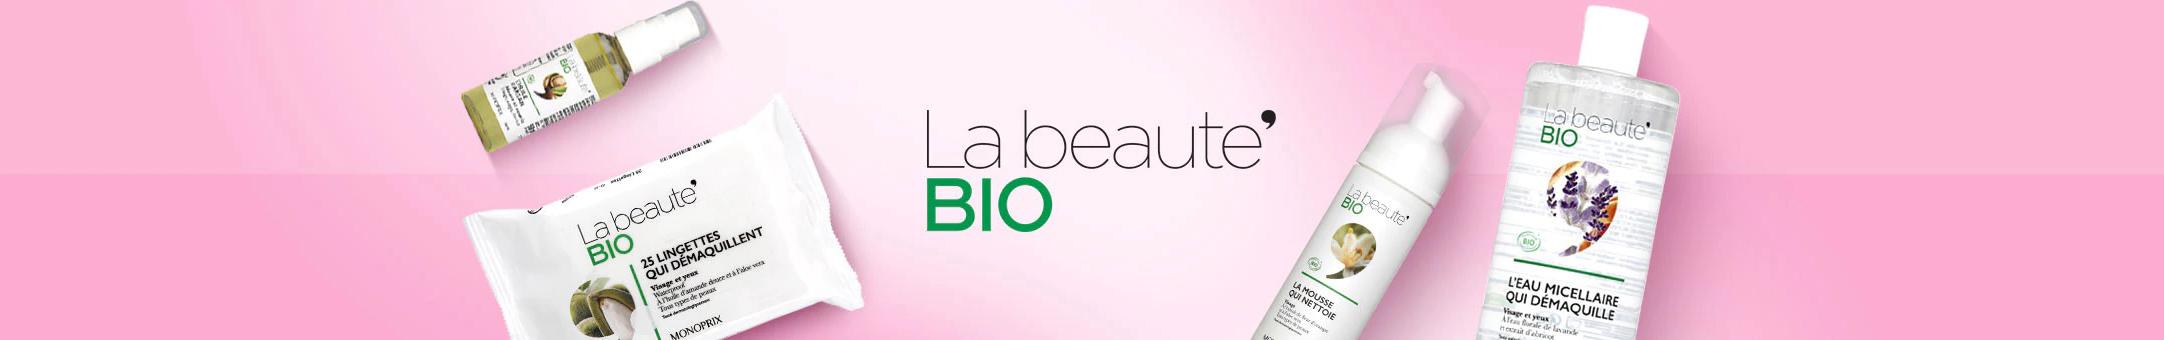 Monoprix_bandeau_beaute-bio_bio_01